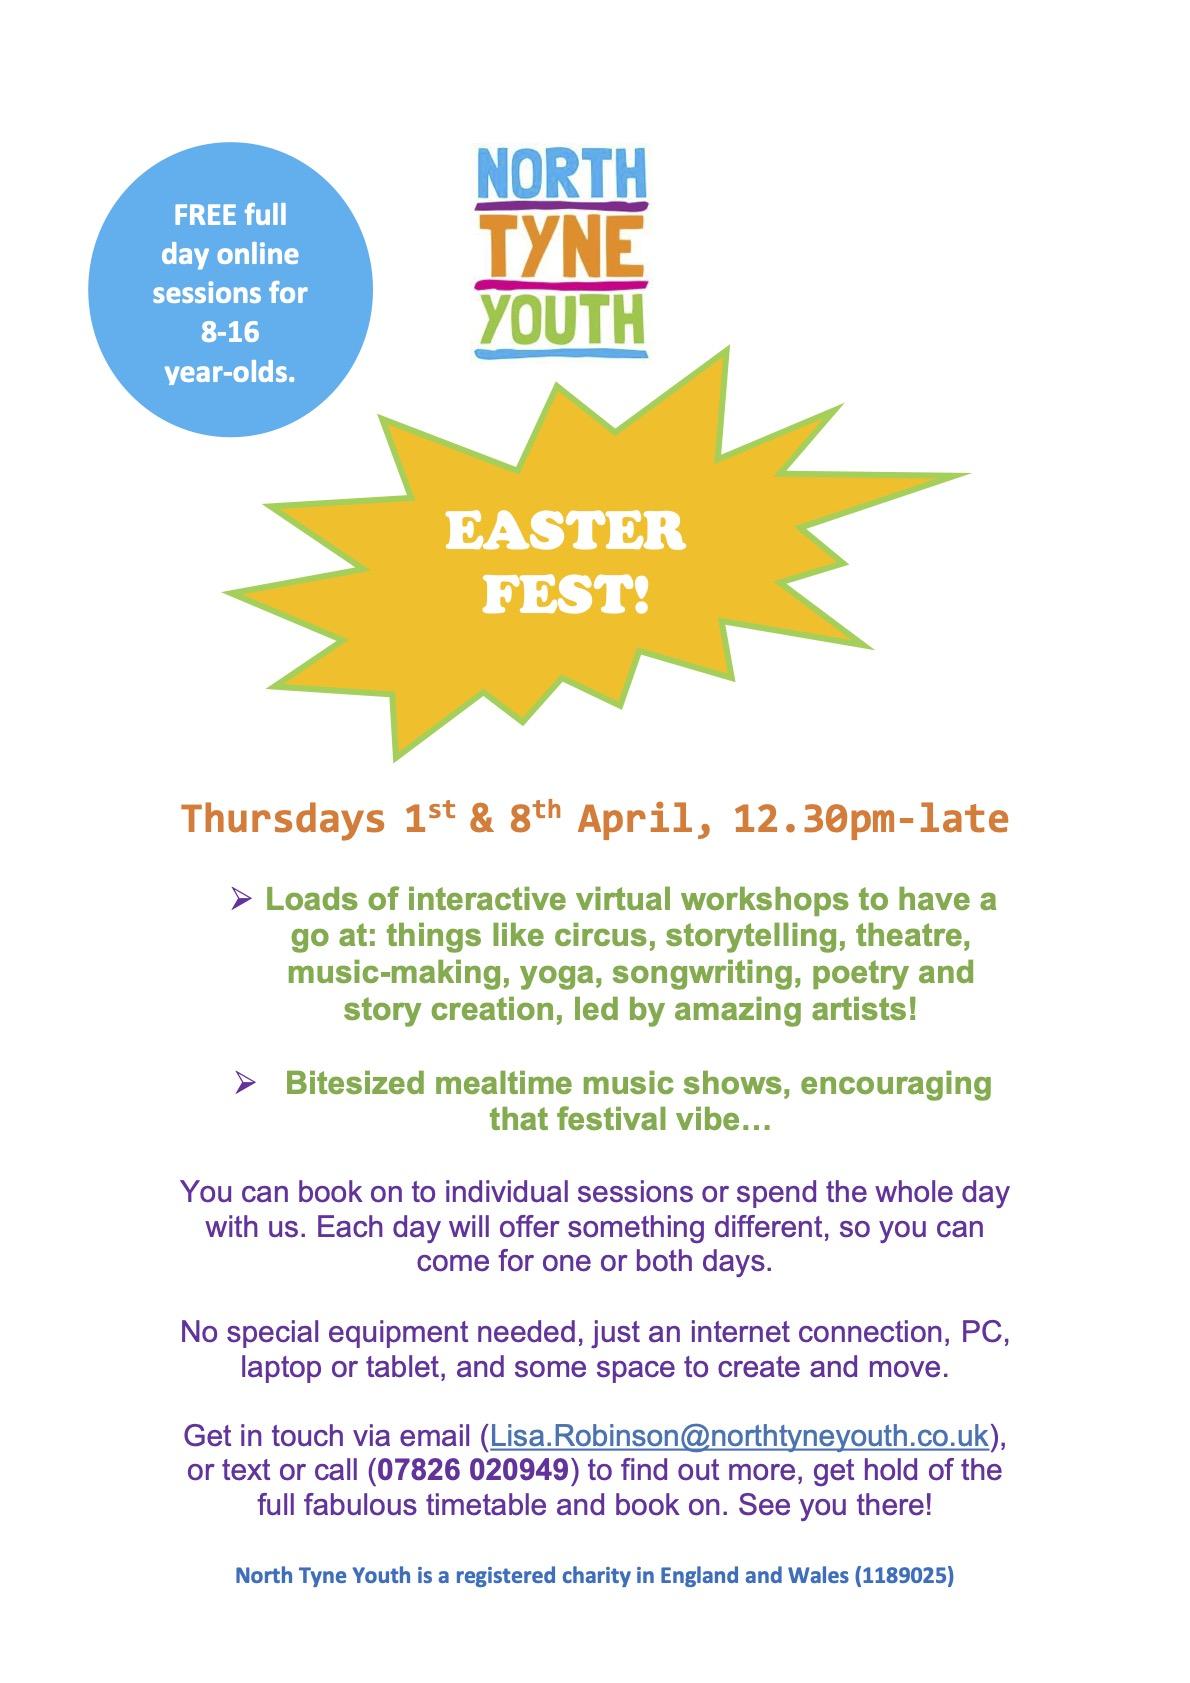 easterfest poster